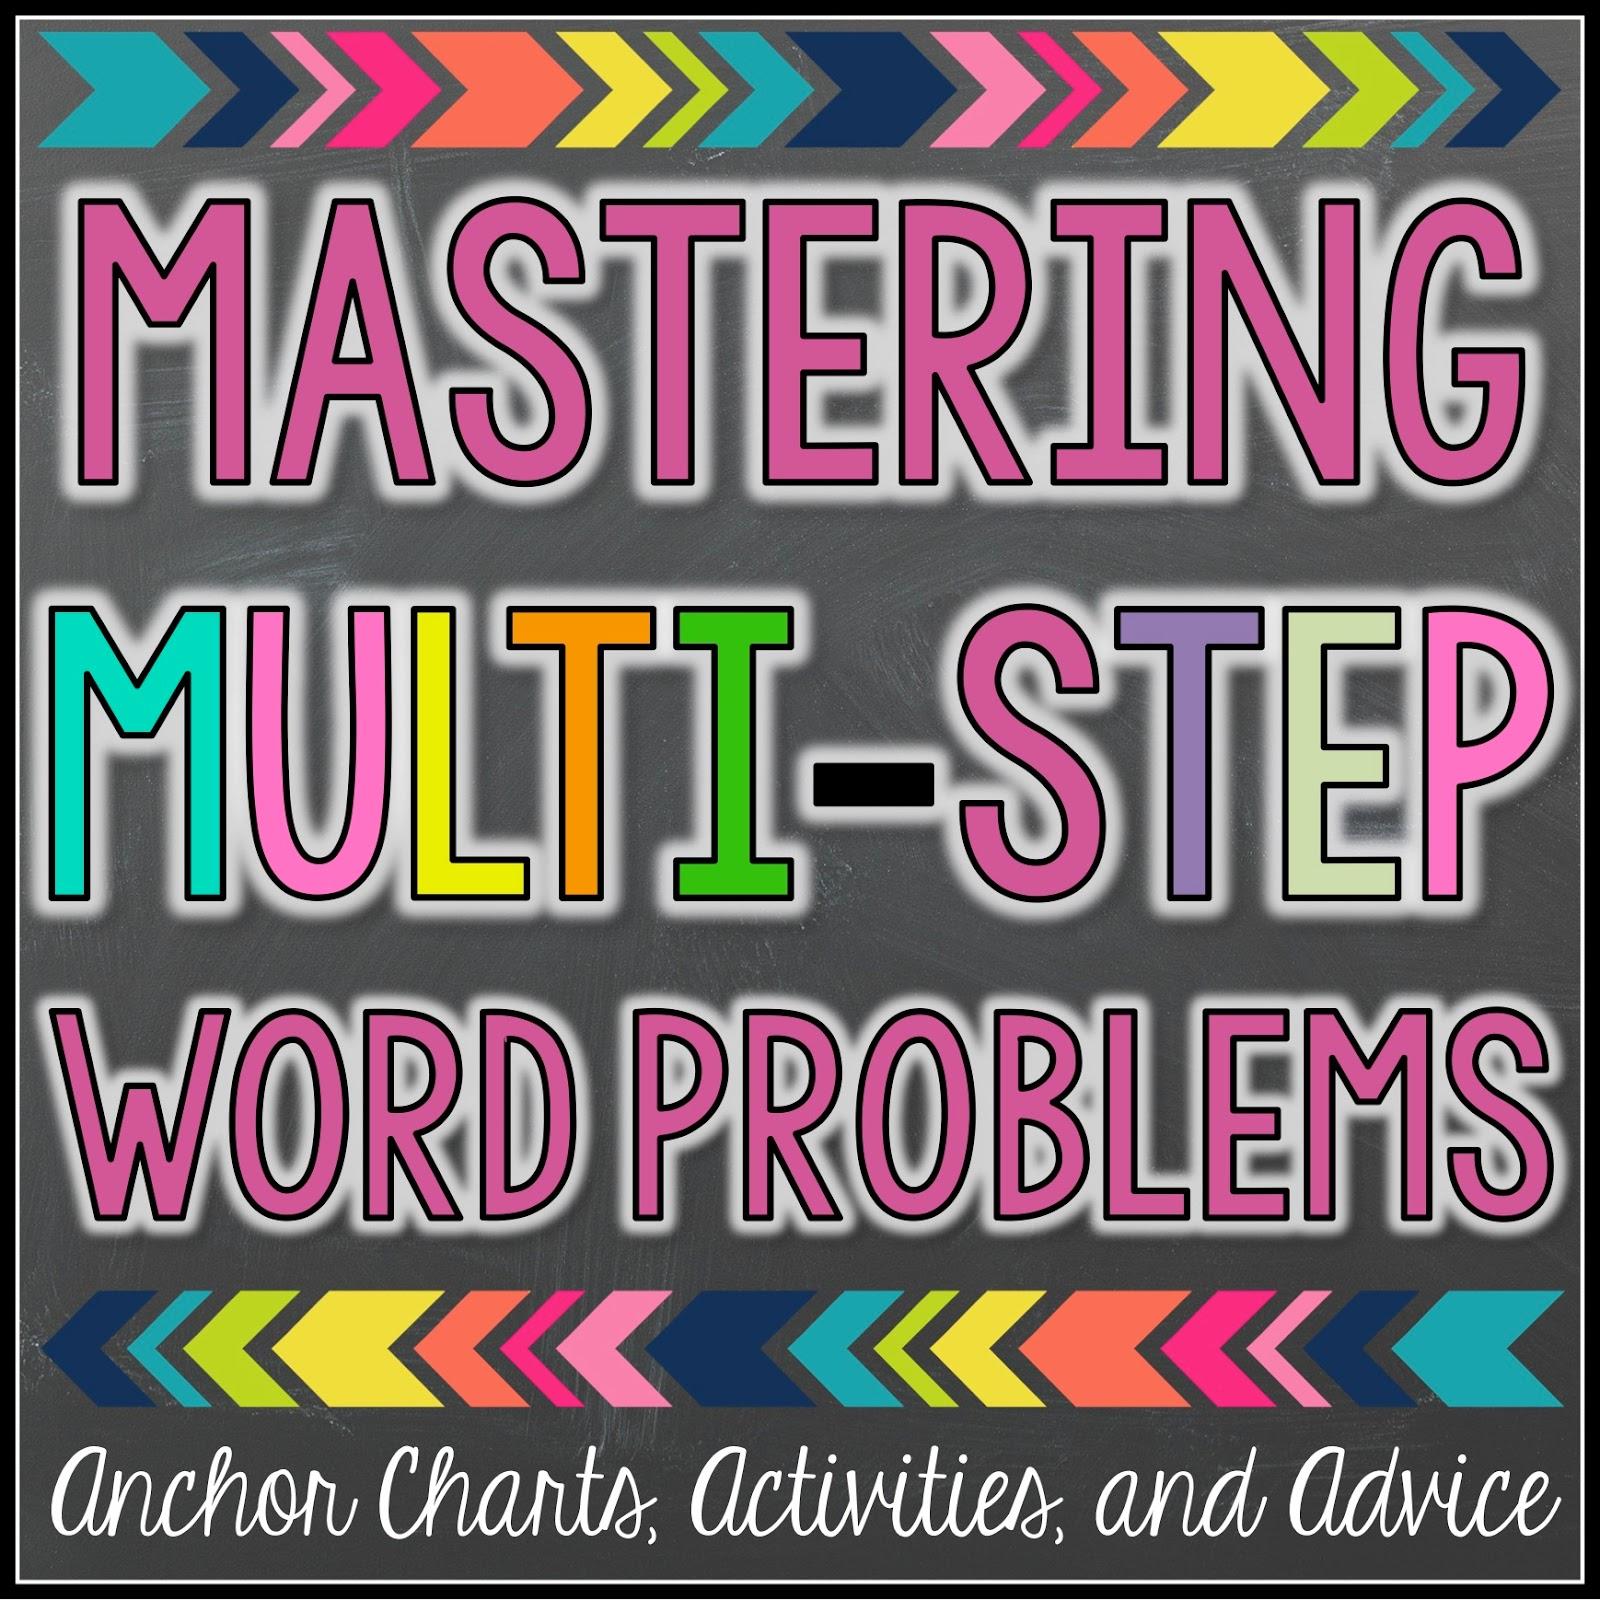 medium resolution of mastering multi step word problems